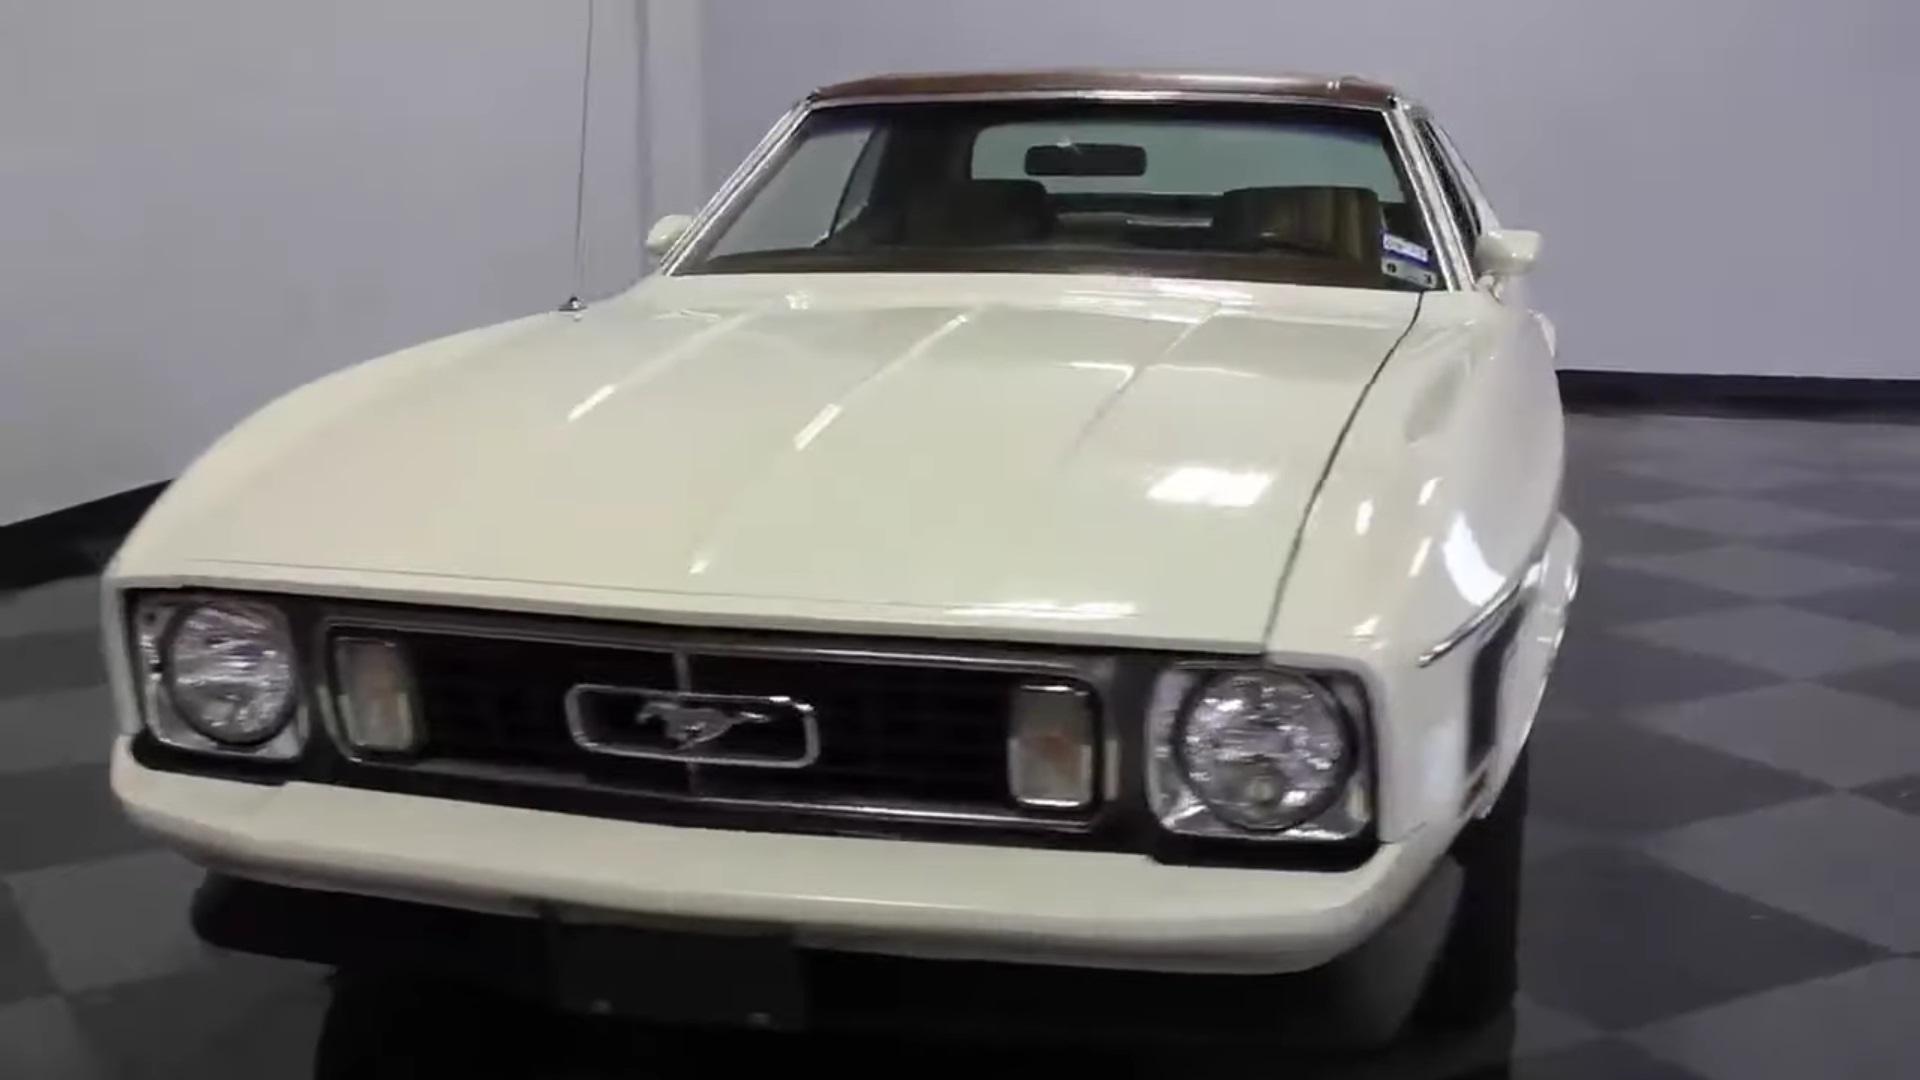 Video: 1973 Ford Mustang Grande Quick Walkaround